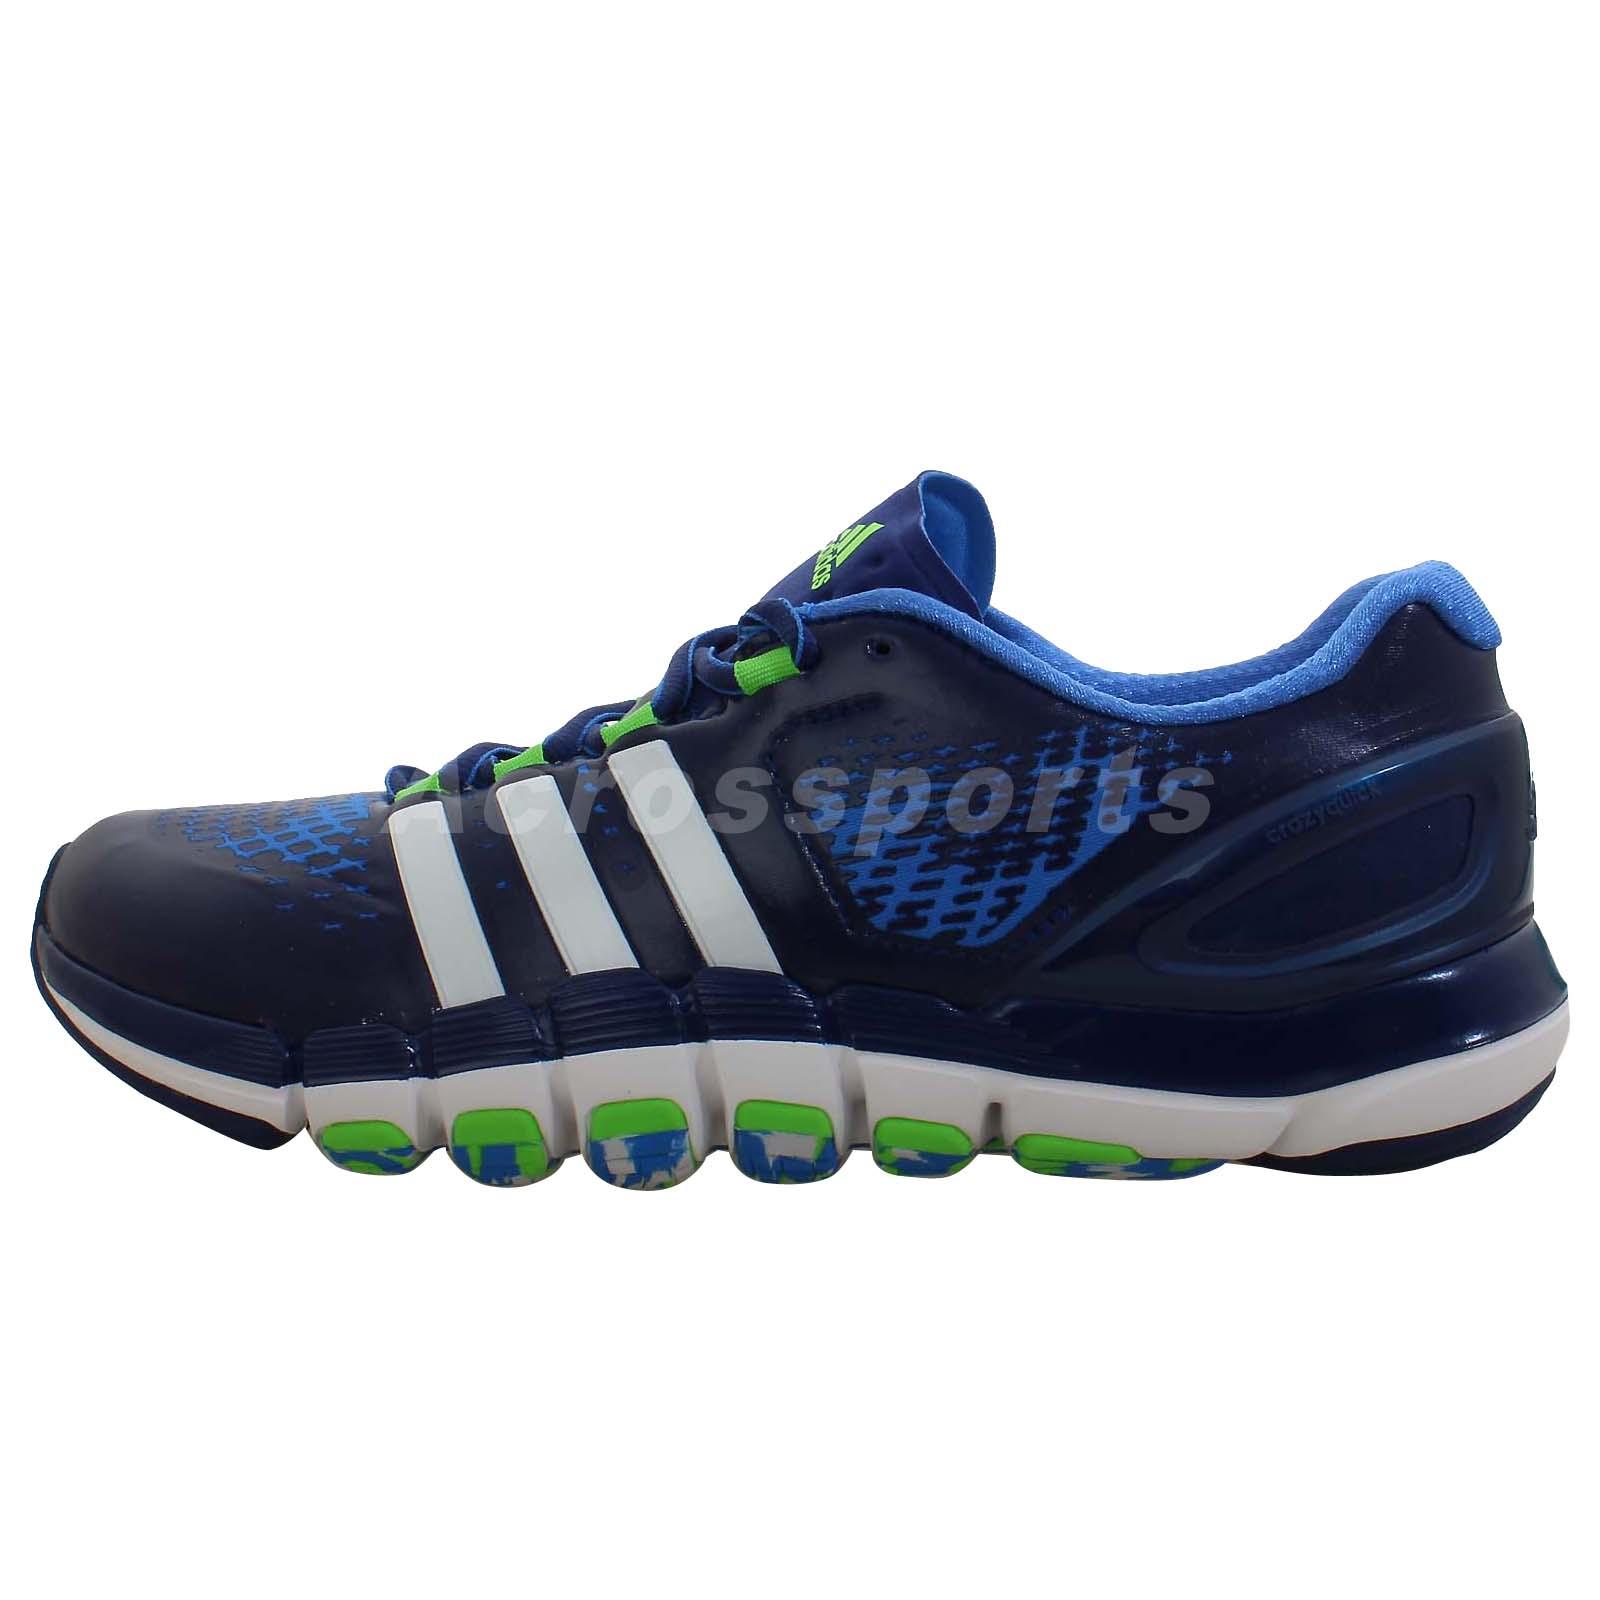 Adidas Adipure Crazyquick Shoes